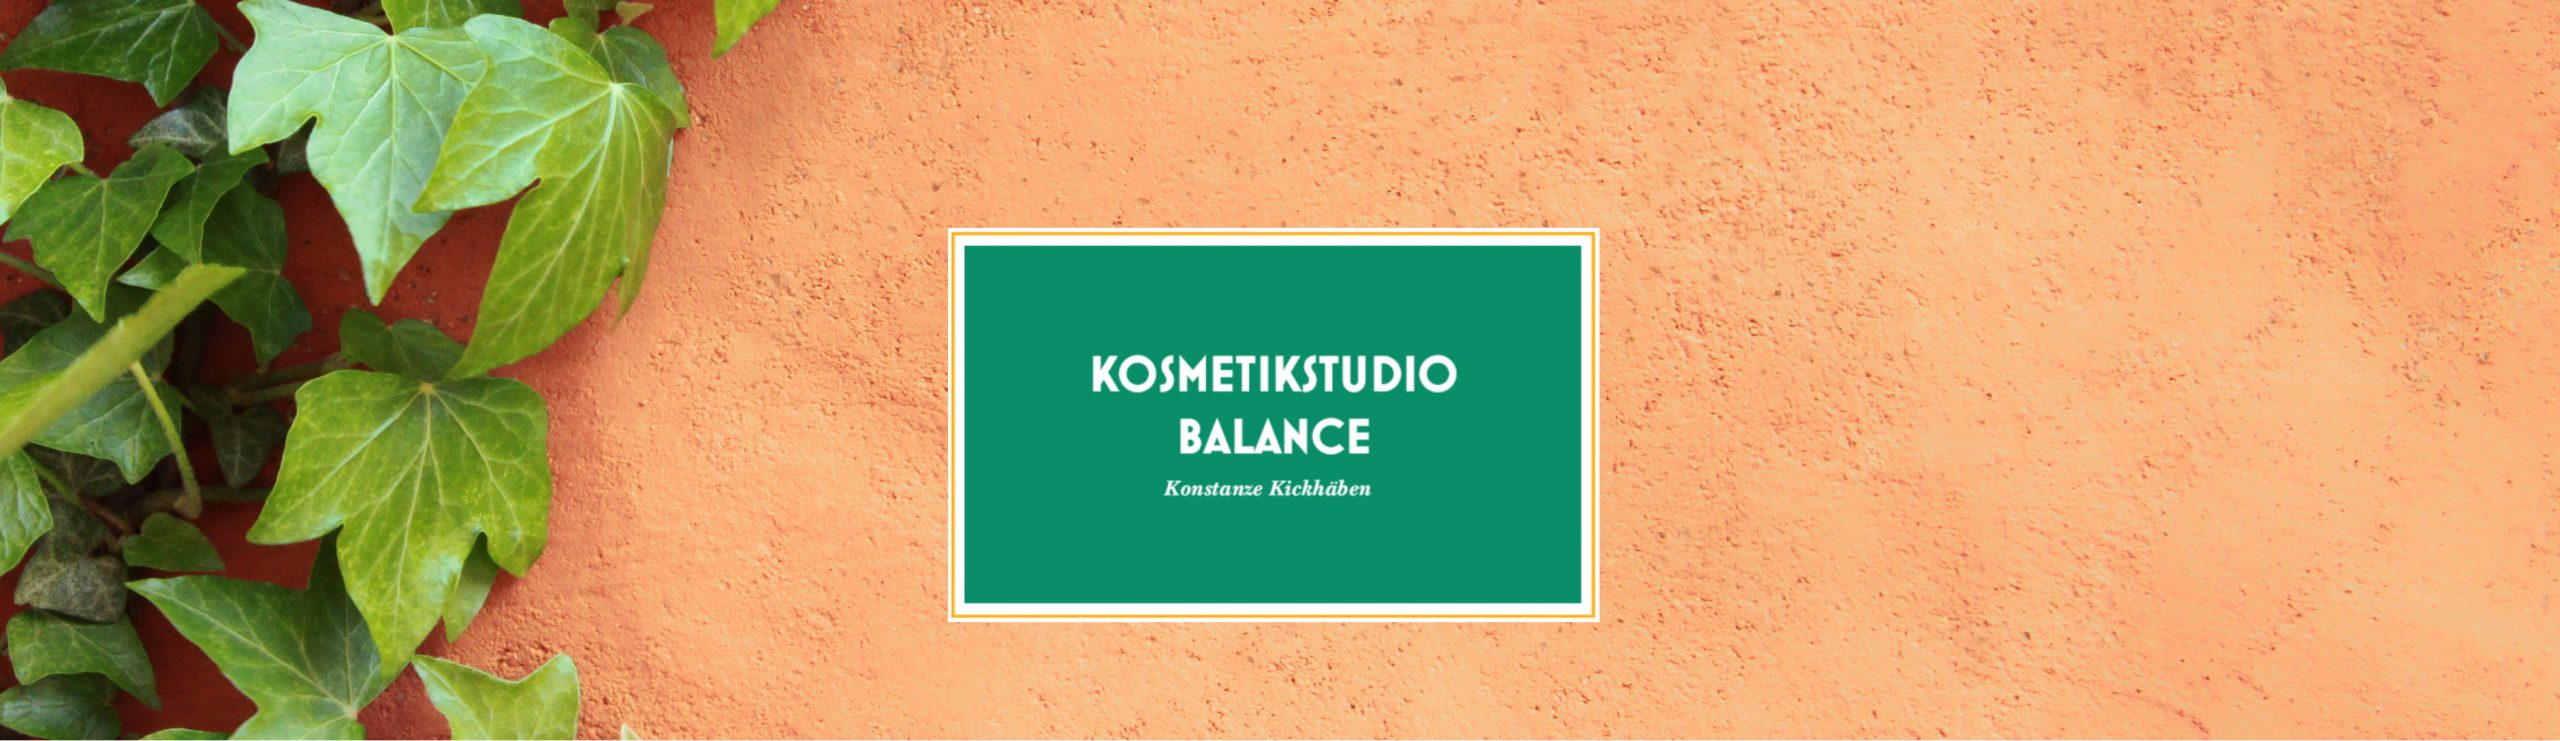 Kosmetikstudio Balance Scharnebeck